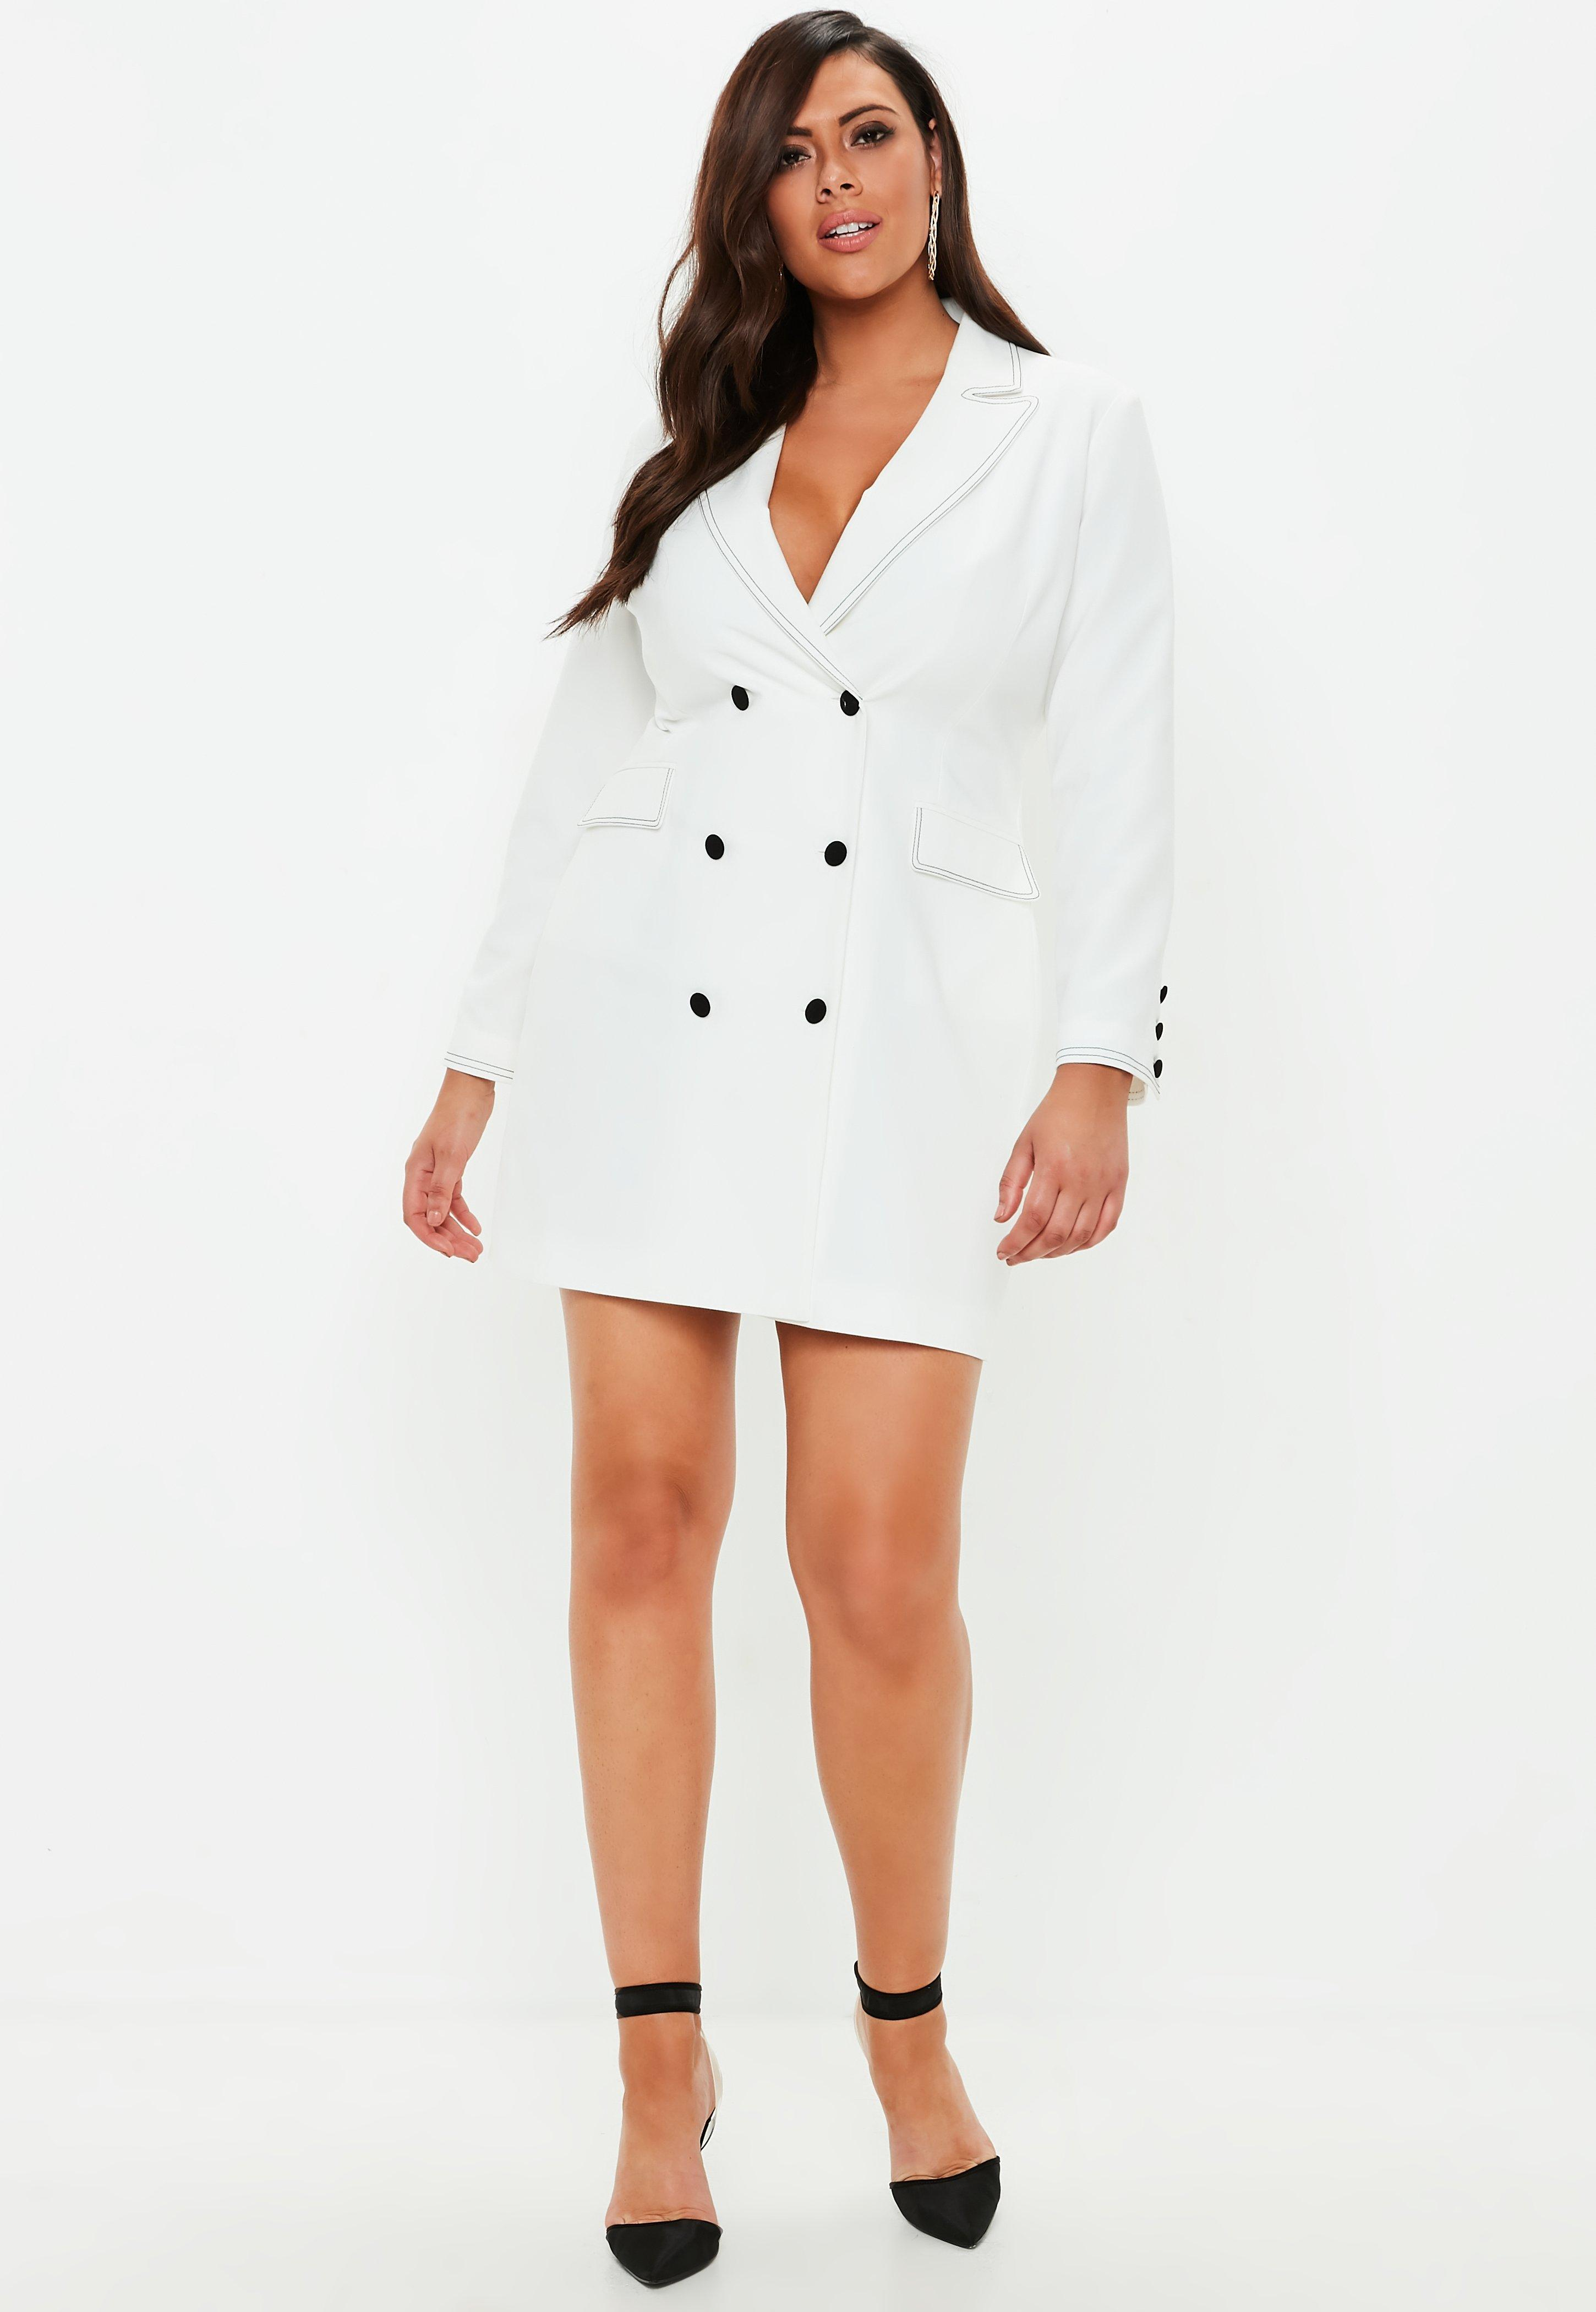 Lyst - Missguided Plus Size White Crepe Contrast Stitch Blazer Dress ...